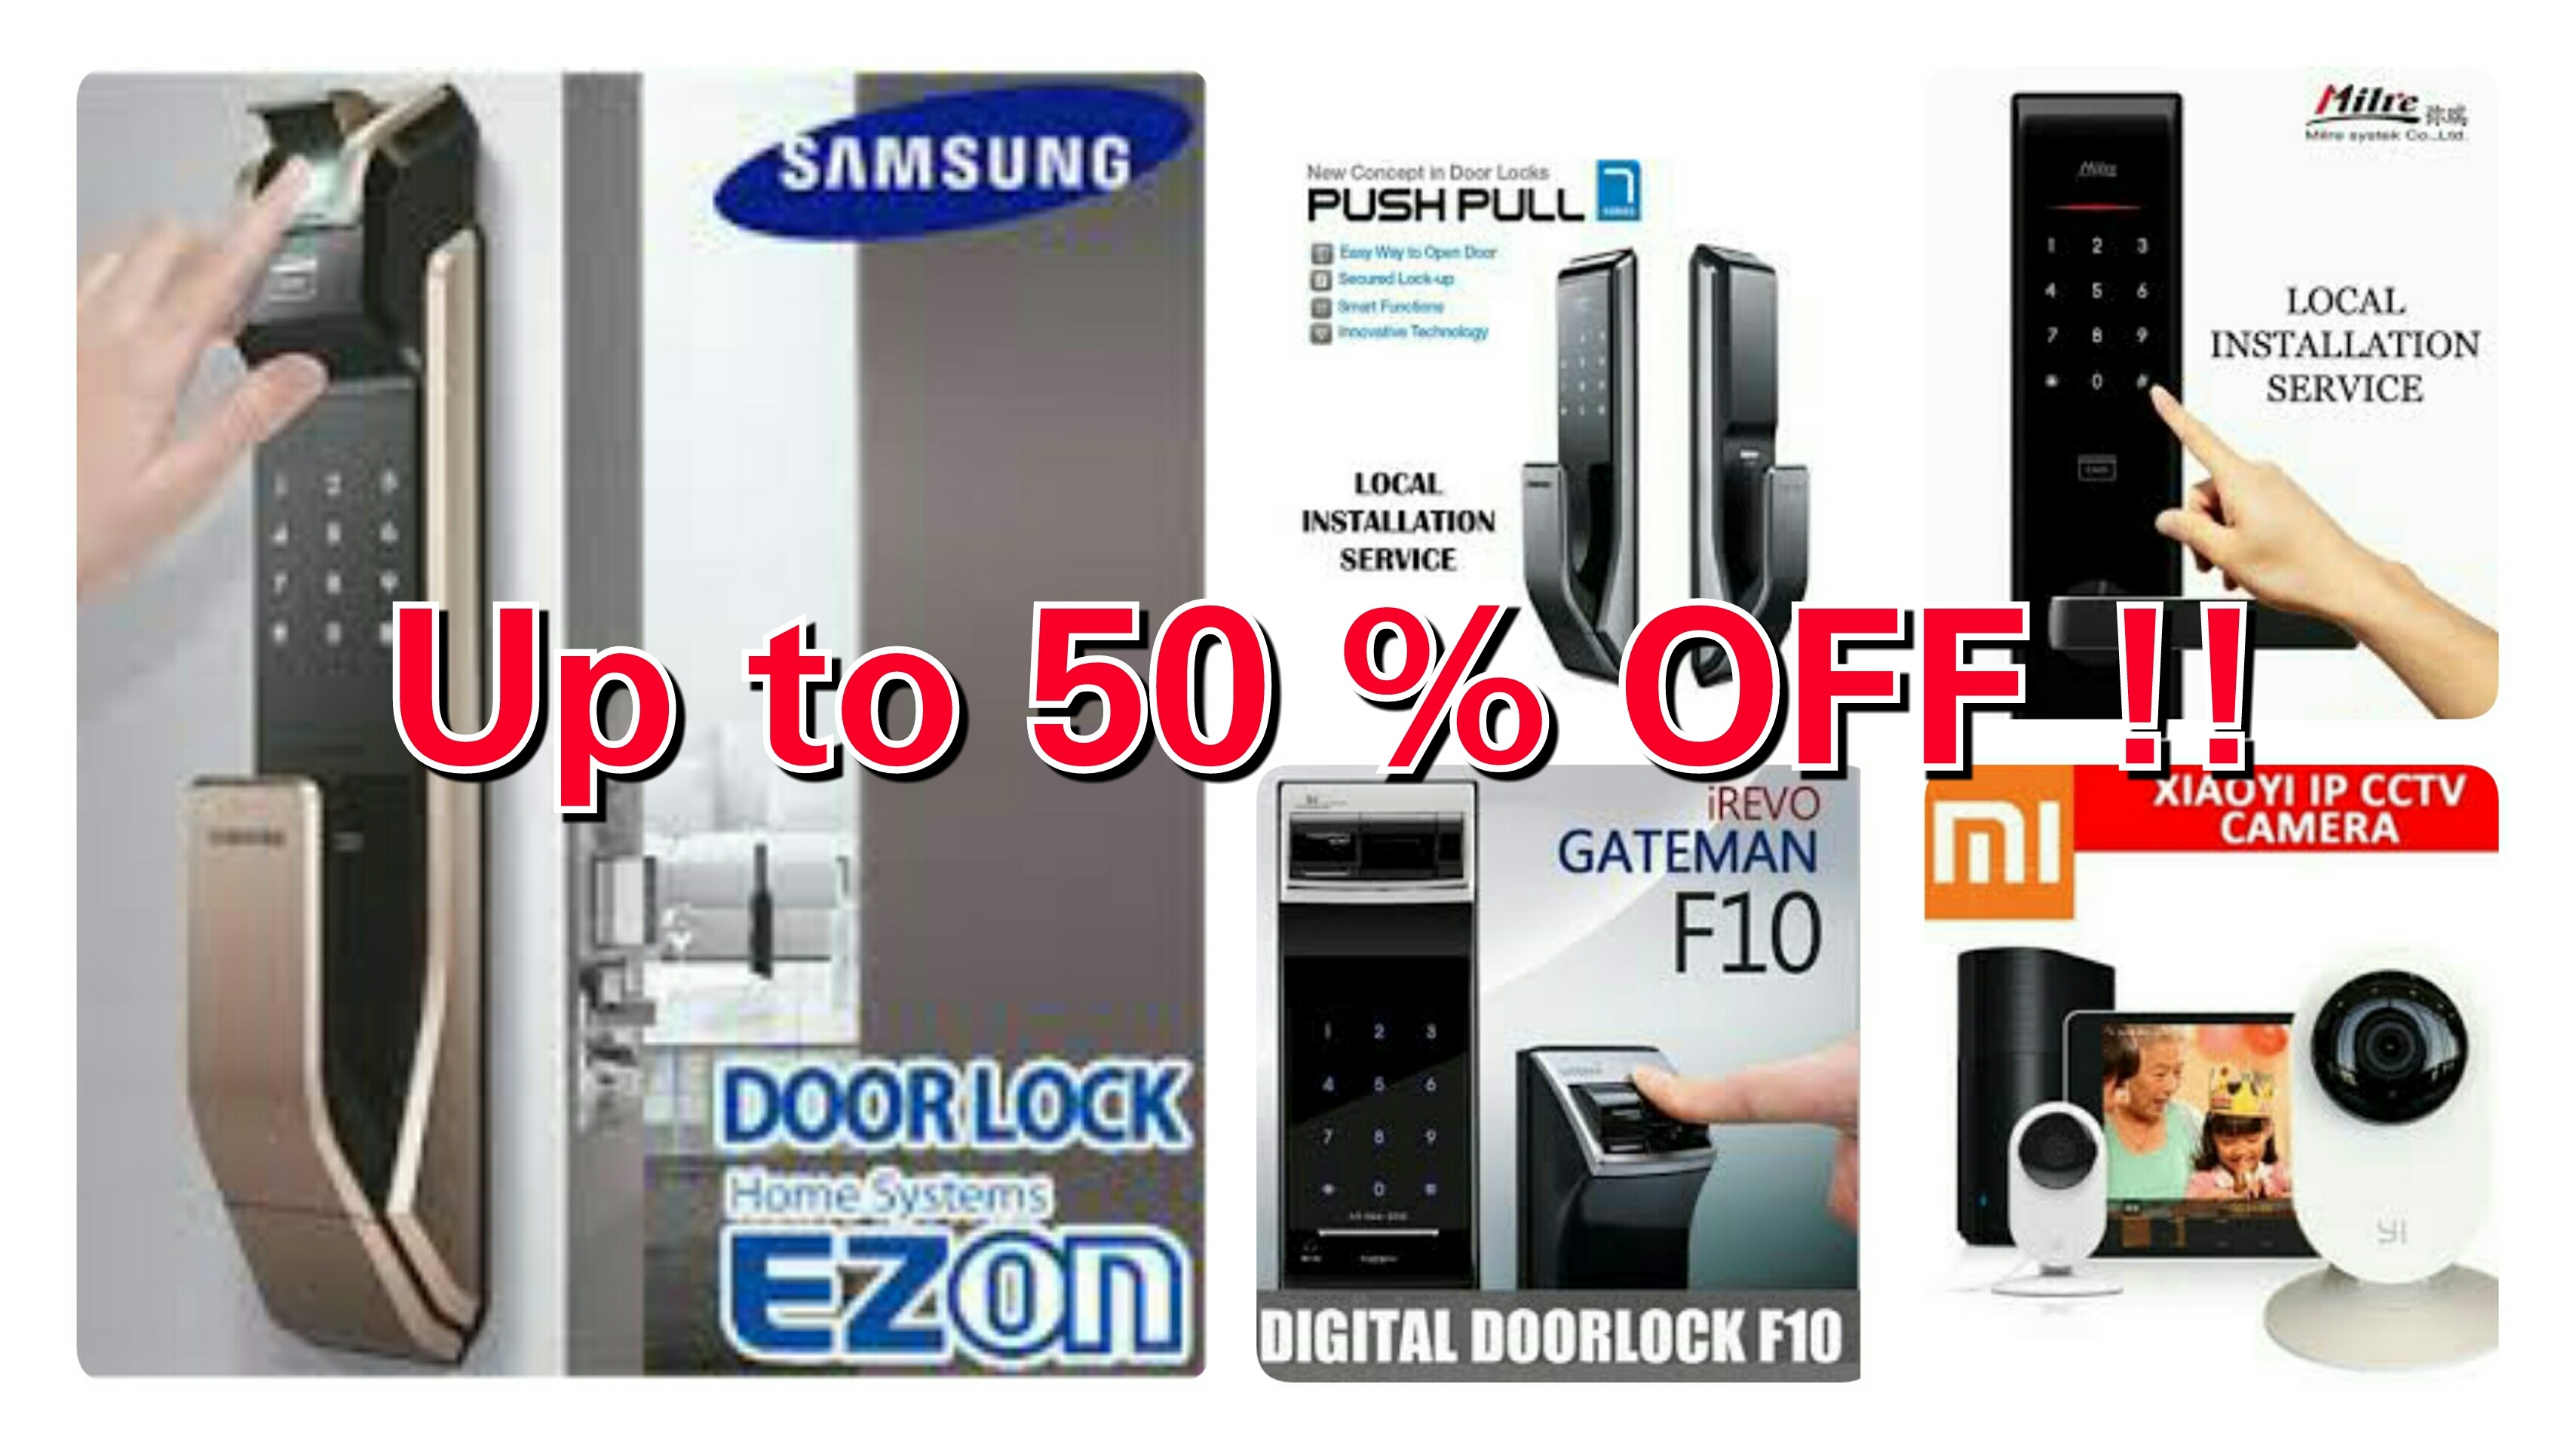 Samsung Gateman Milre Digital Door Lock Ip Camera Gold Keypad Keyless Electronic